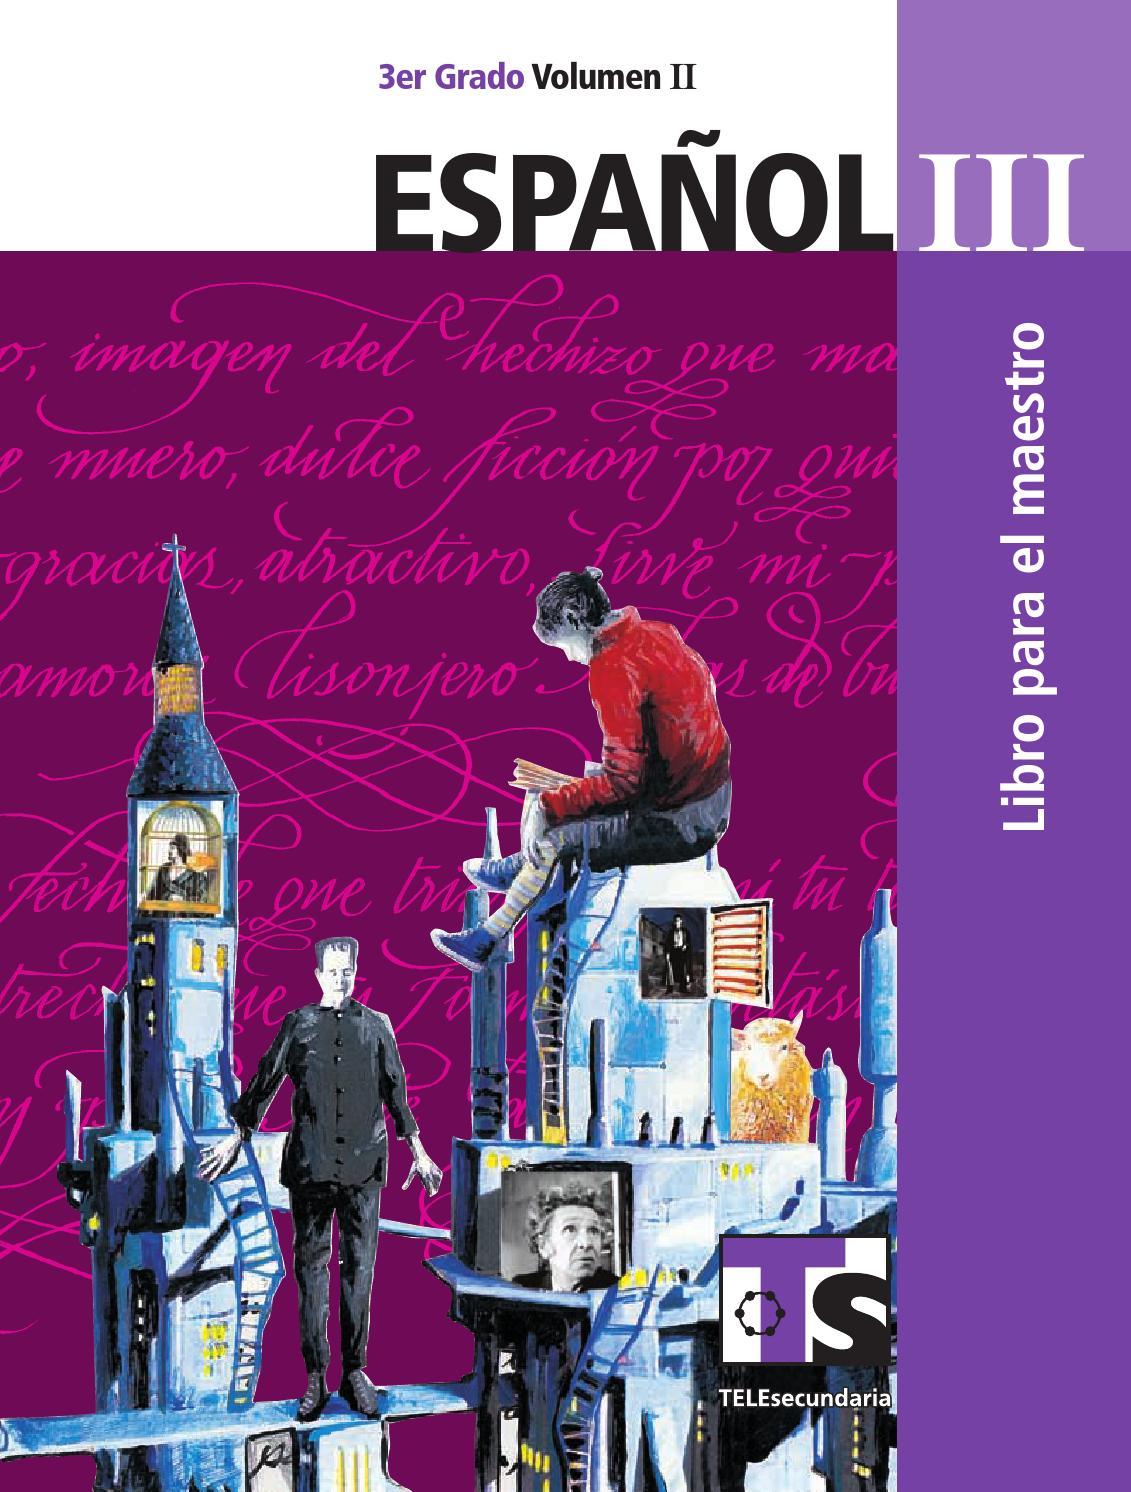 Maestro. Español 3er. Grado Volumen II by Rarámuri - issuu